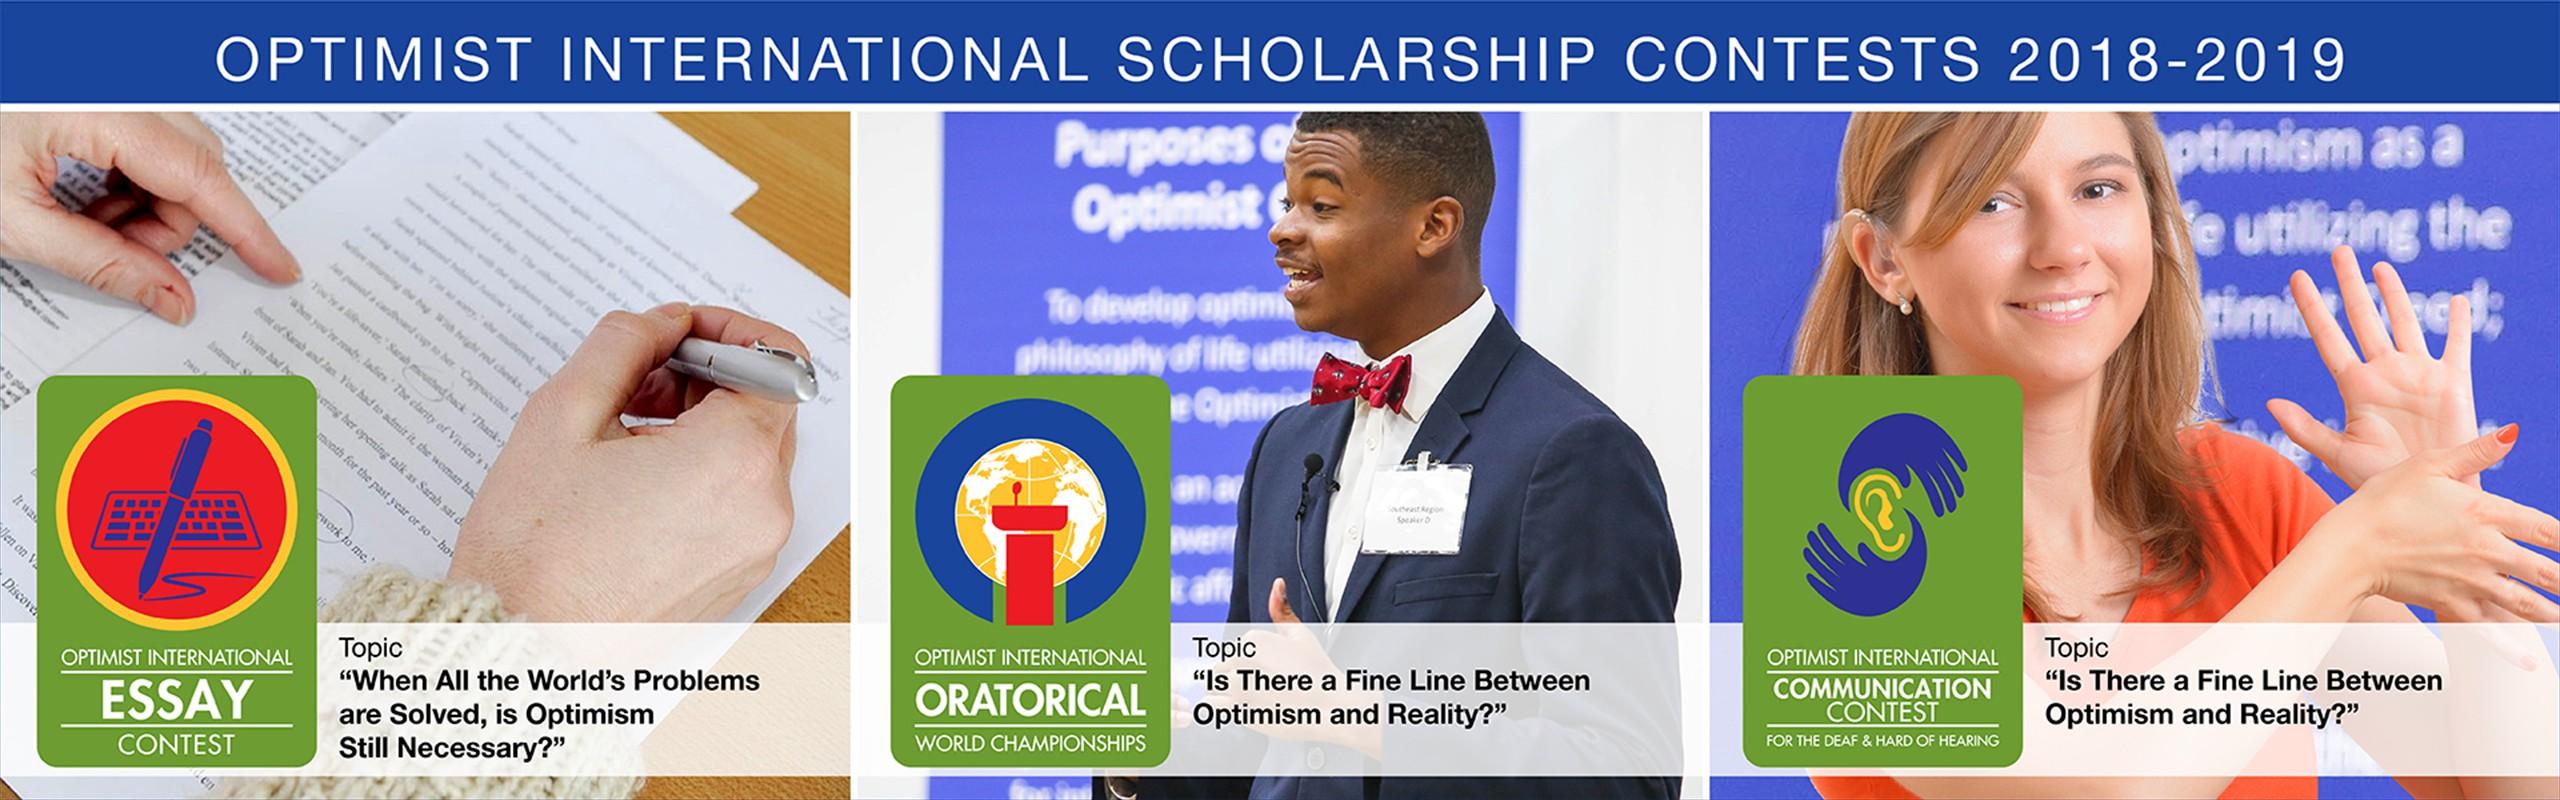 004 Essay Example Optimist International Contest Scholarships Webbanner Wondrous Oratorical Winners Rules Full